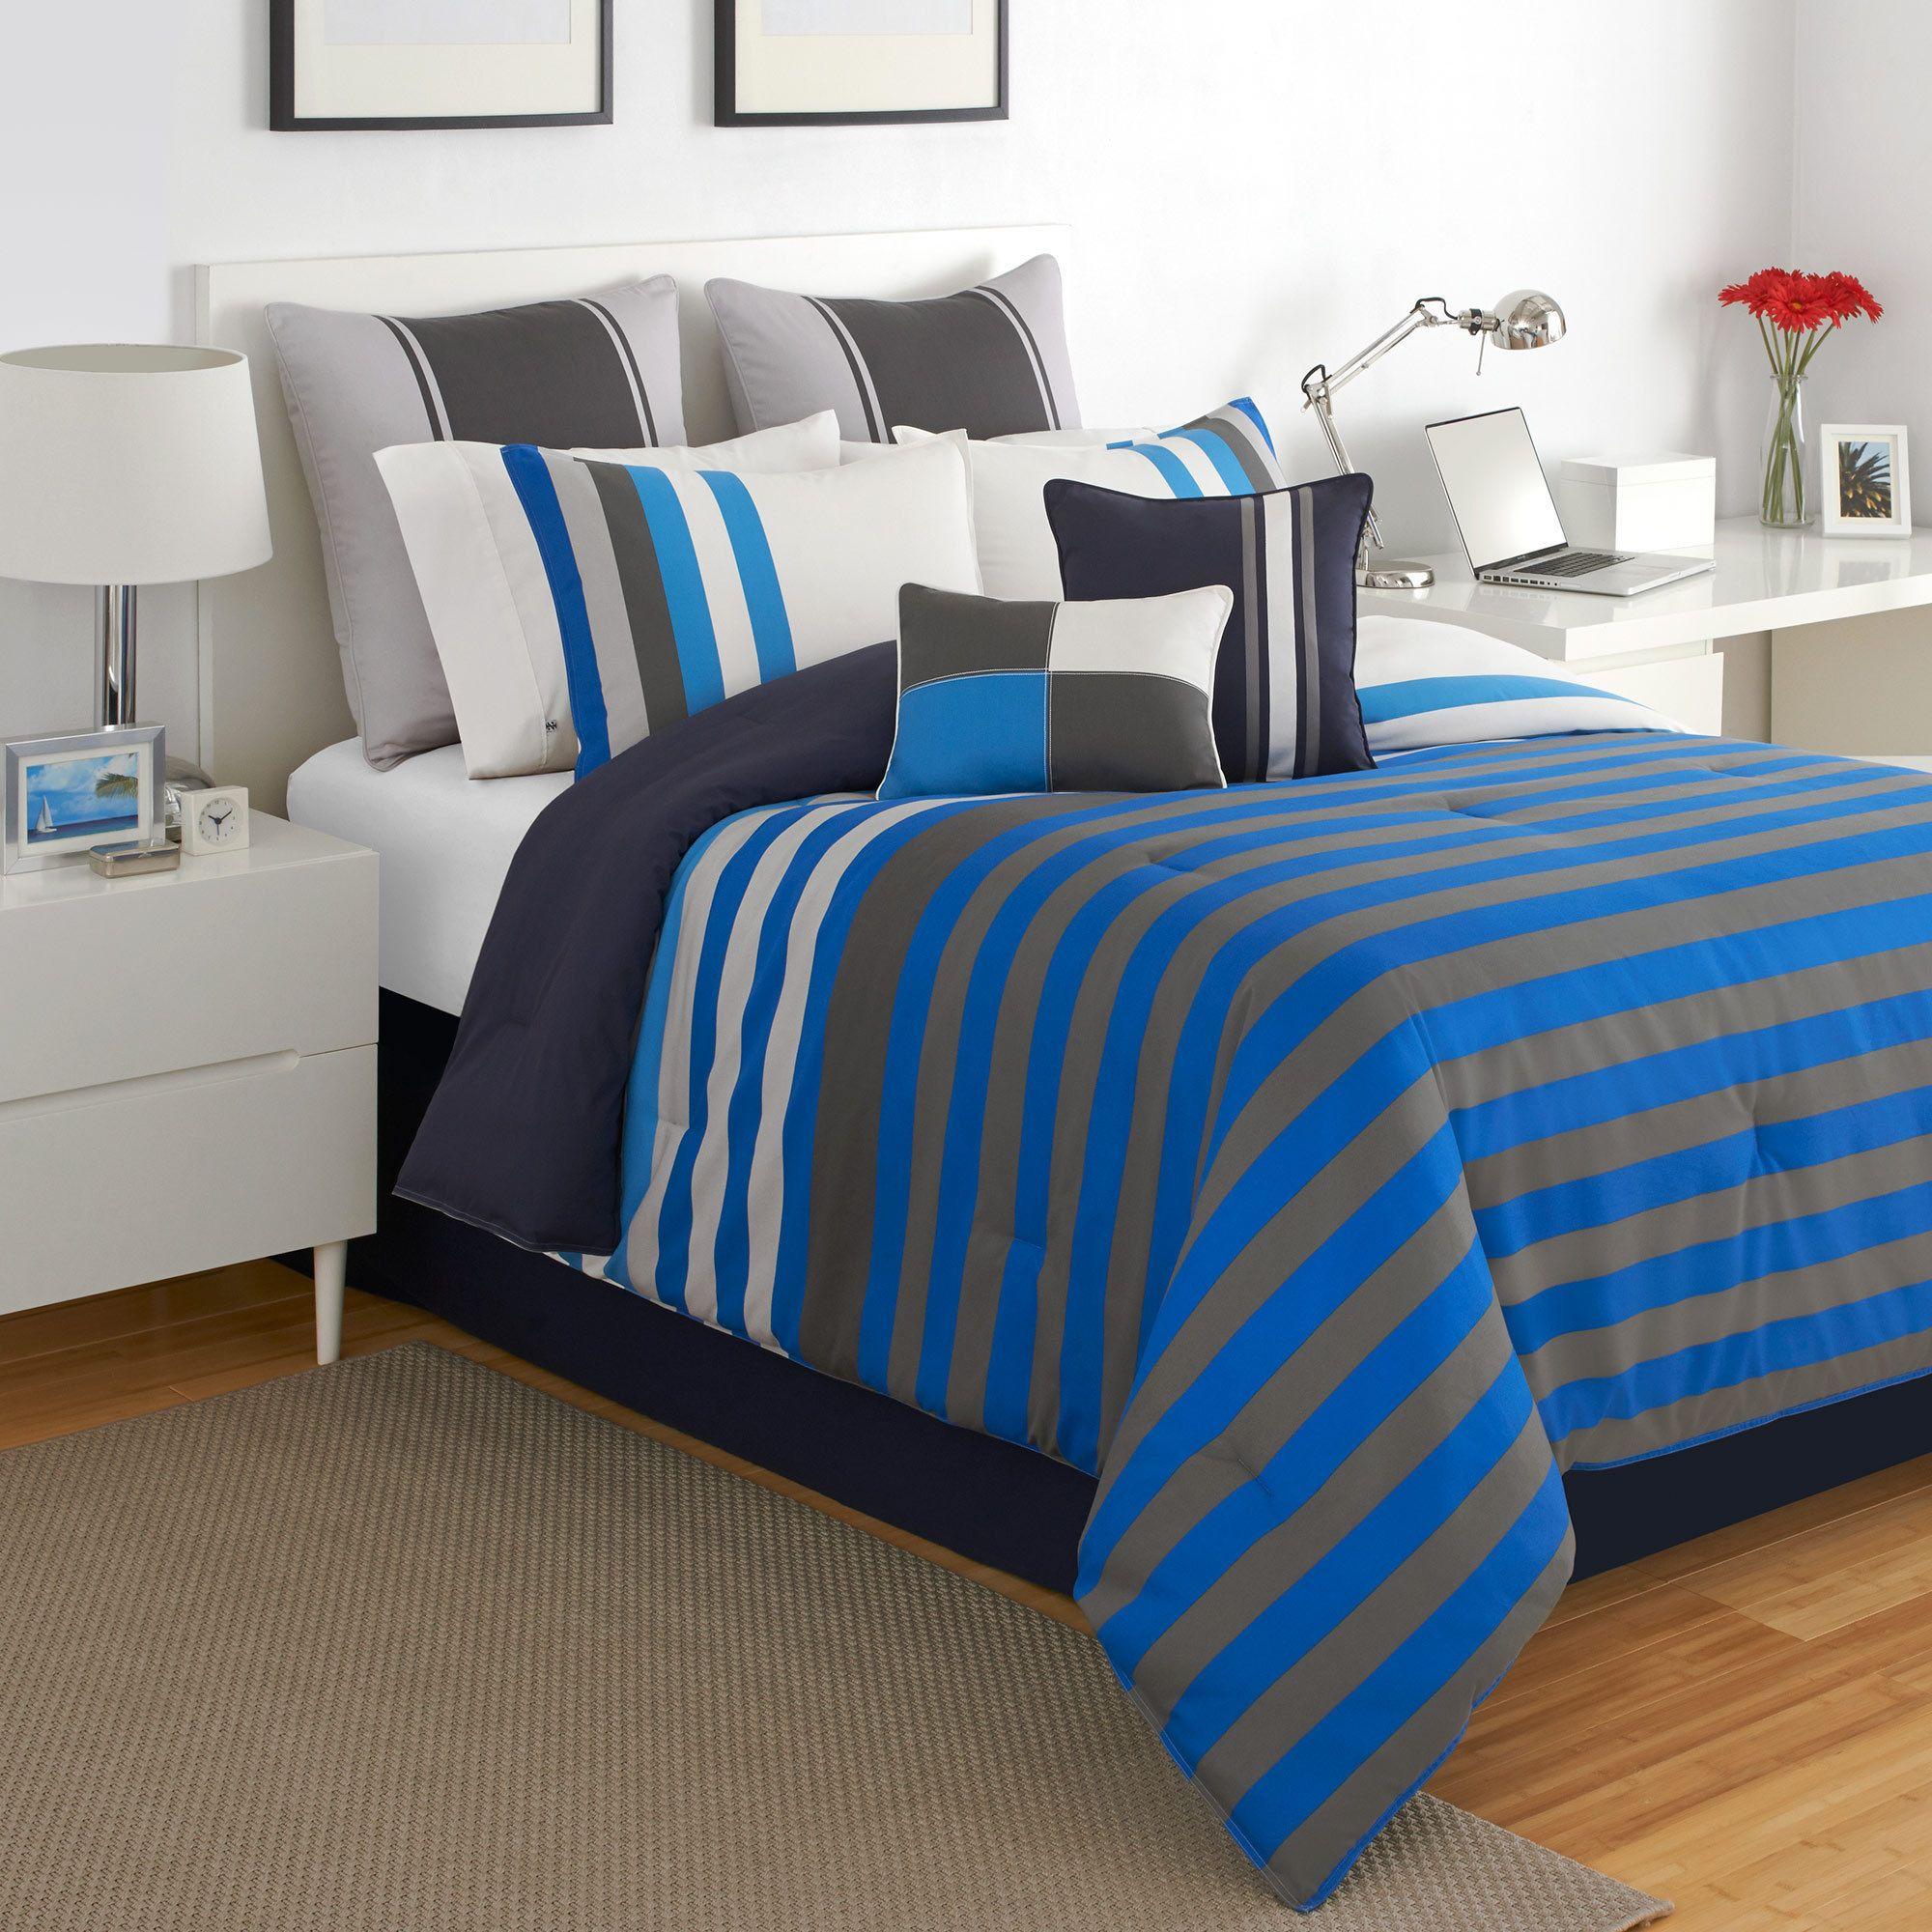 marina mill wear sets pin set s gray bay men house comforter bedding plaid victor nautical